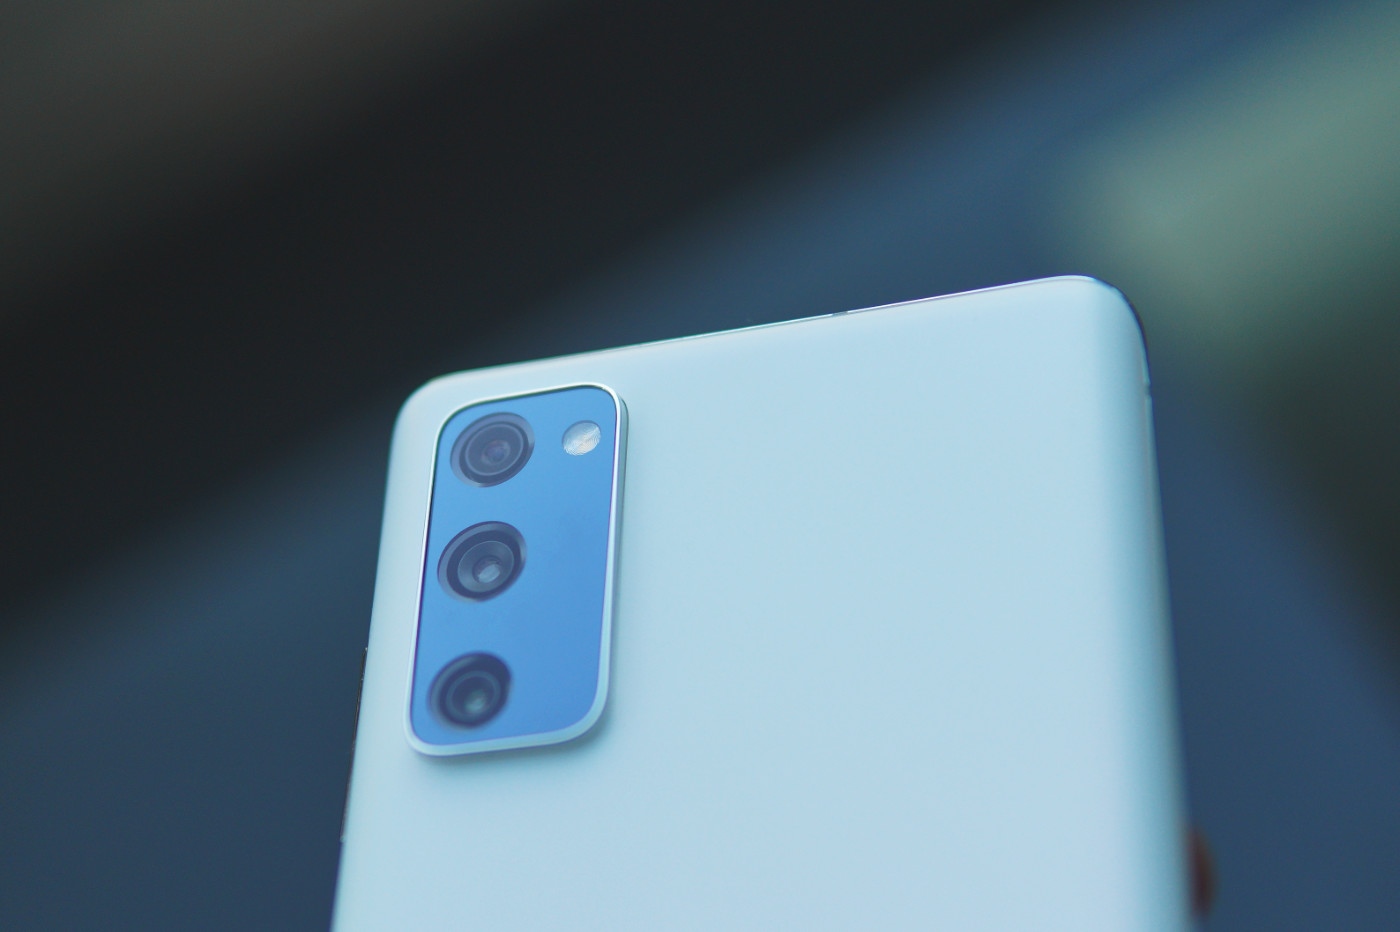 Samsung Galaxy S20 FE photo